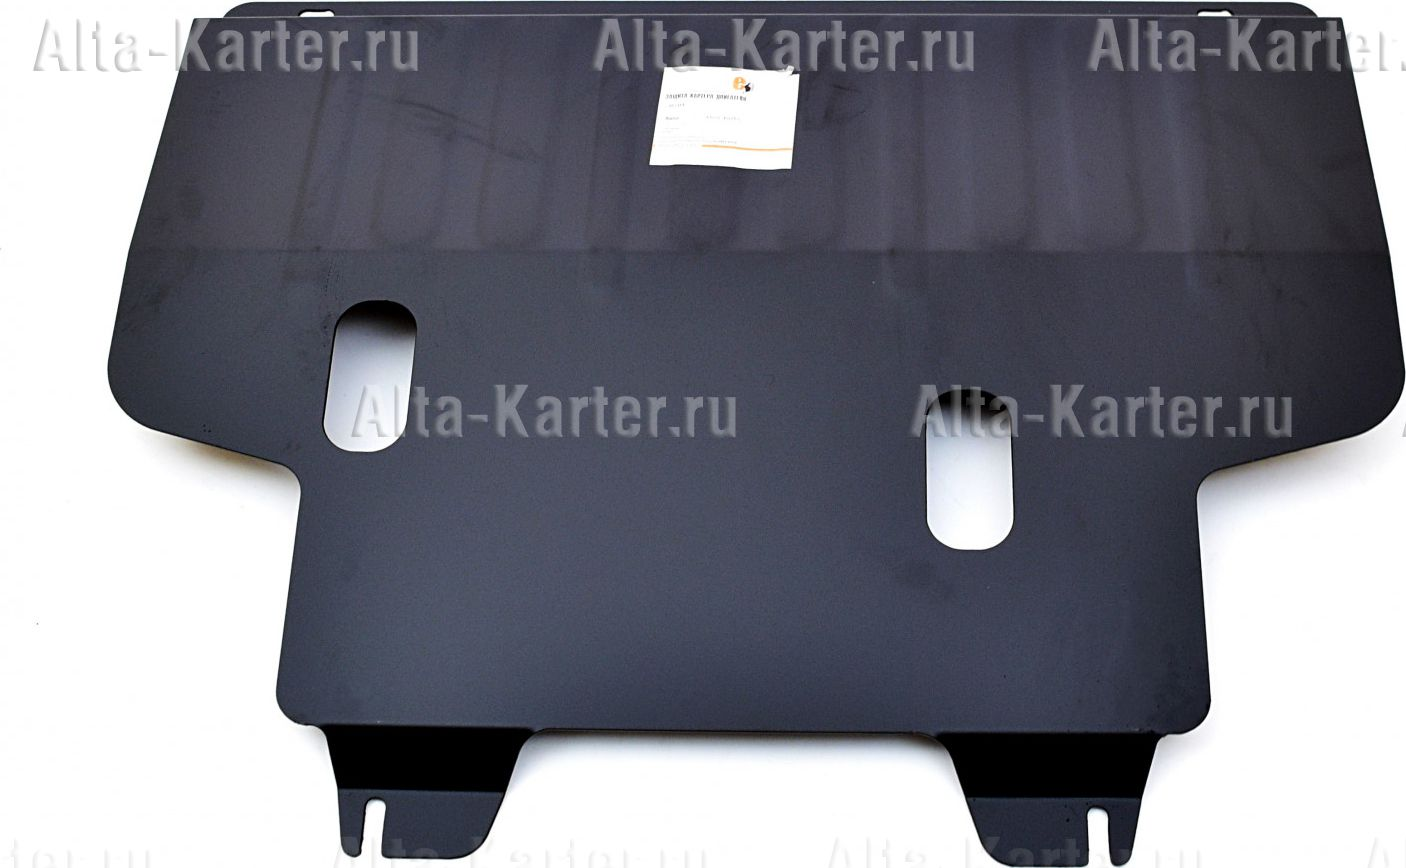 Защита Alfeco для картера и КПП Chery Amulet 2006-2010. Артикул ALF.02.01